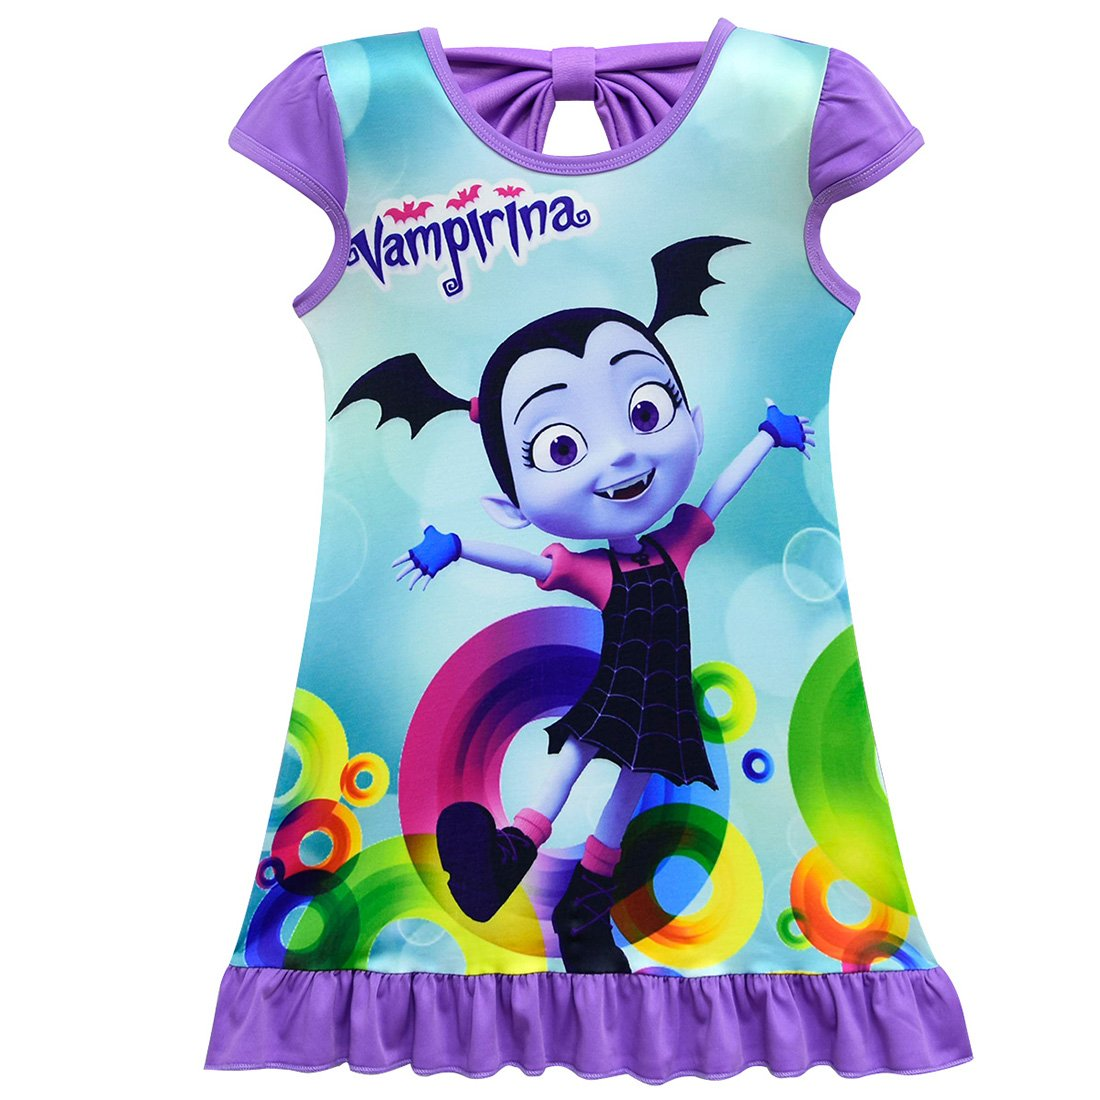 ZHBNN Vampirina Toddler Girls Summer Nightgown Pajamas Party dress(Purple,110/4-5Y)